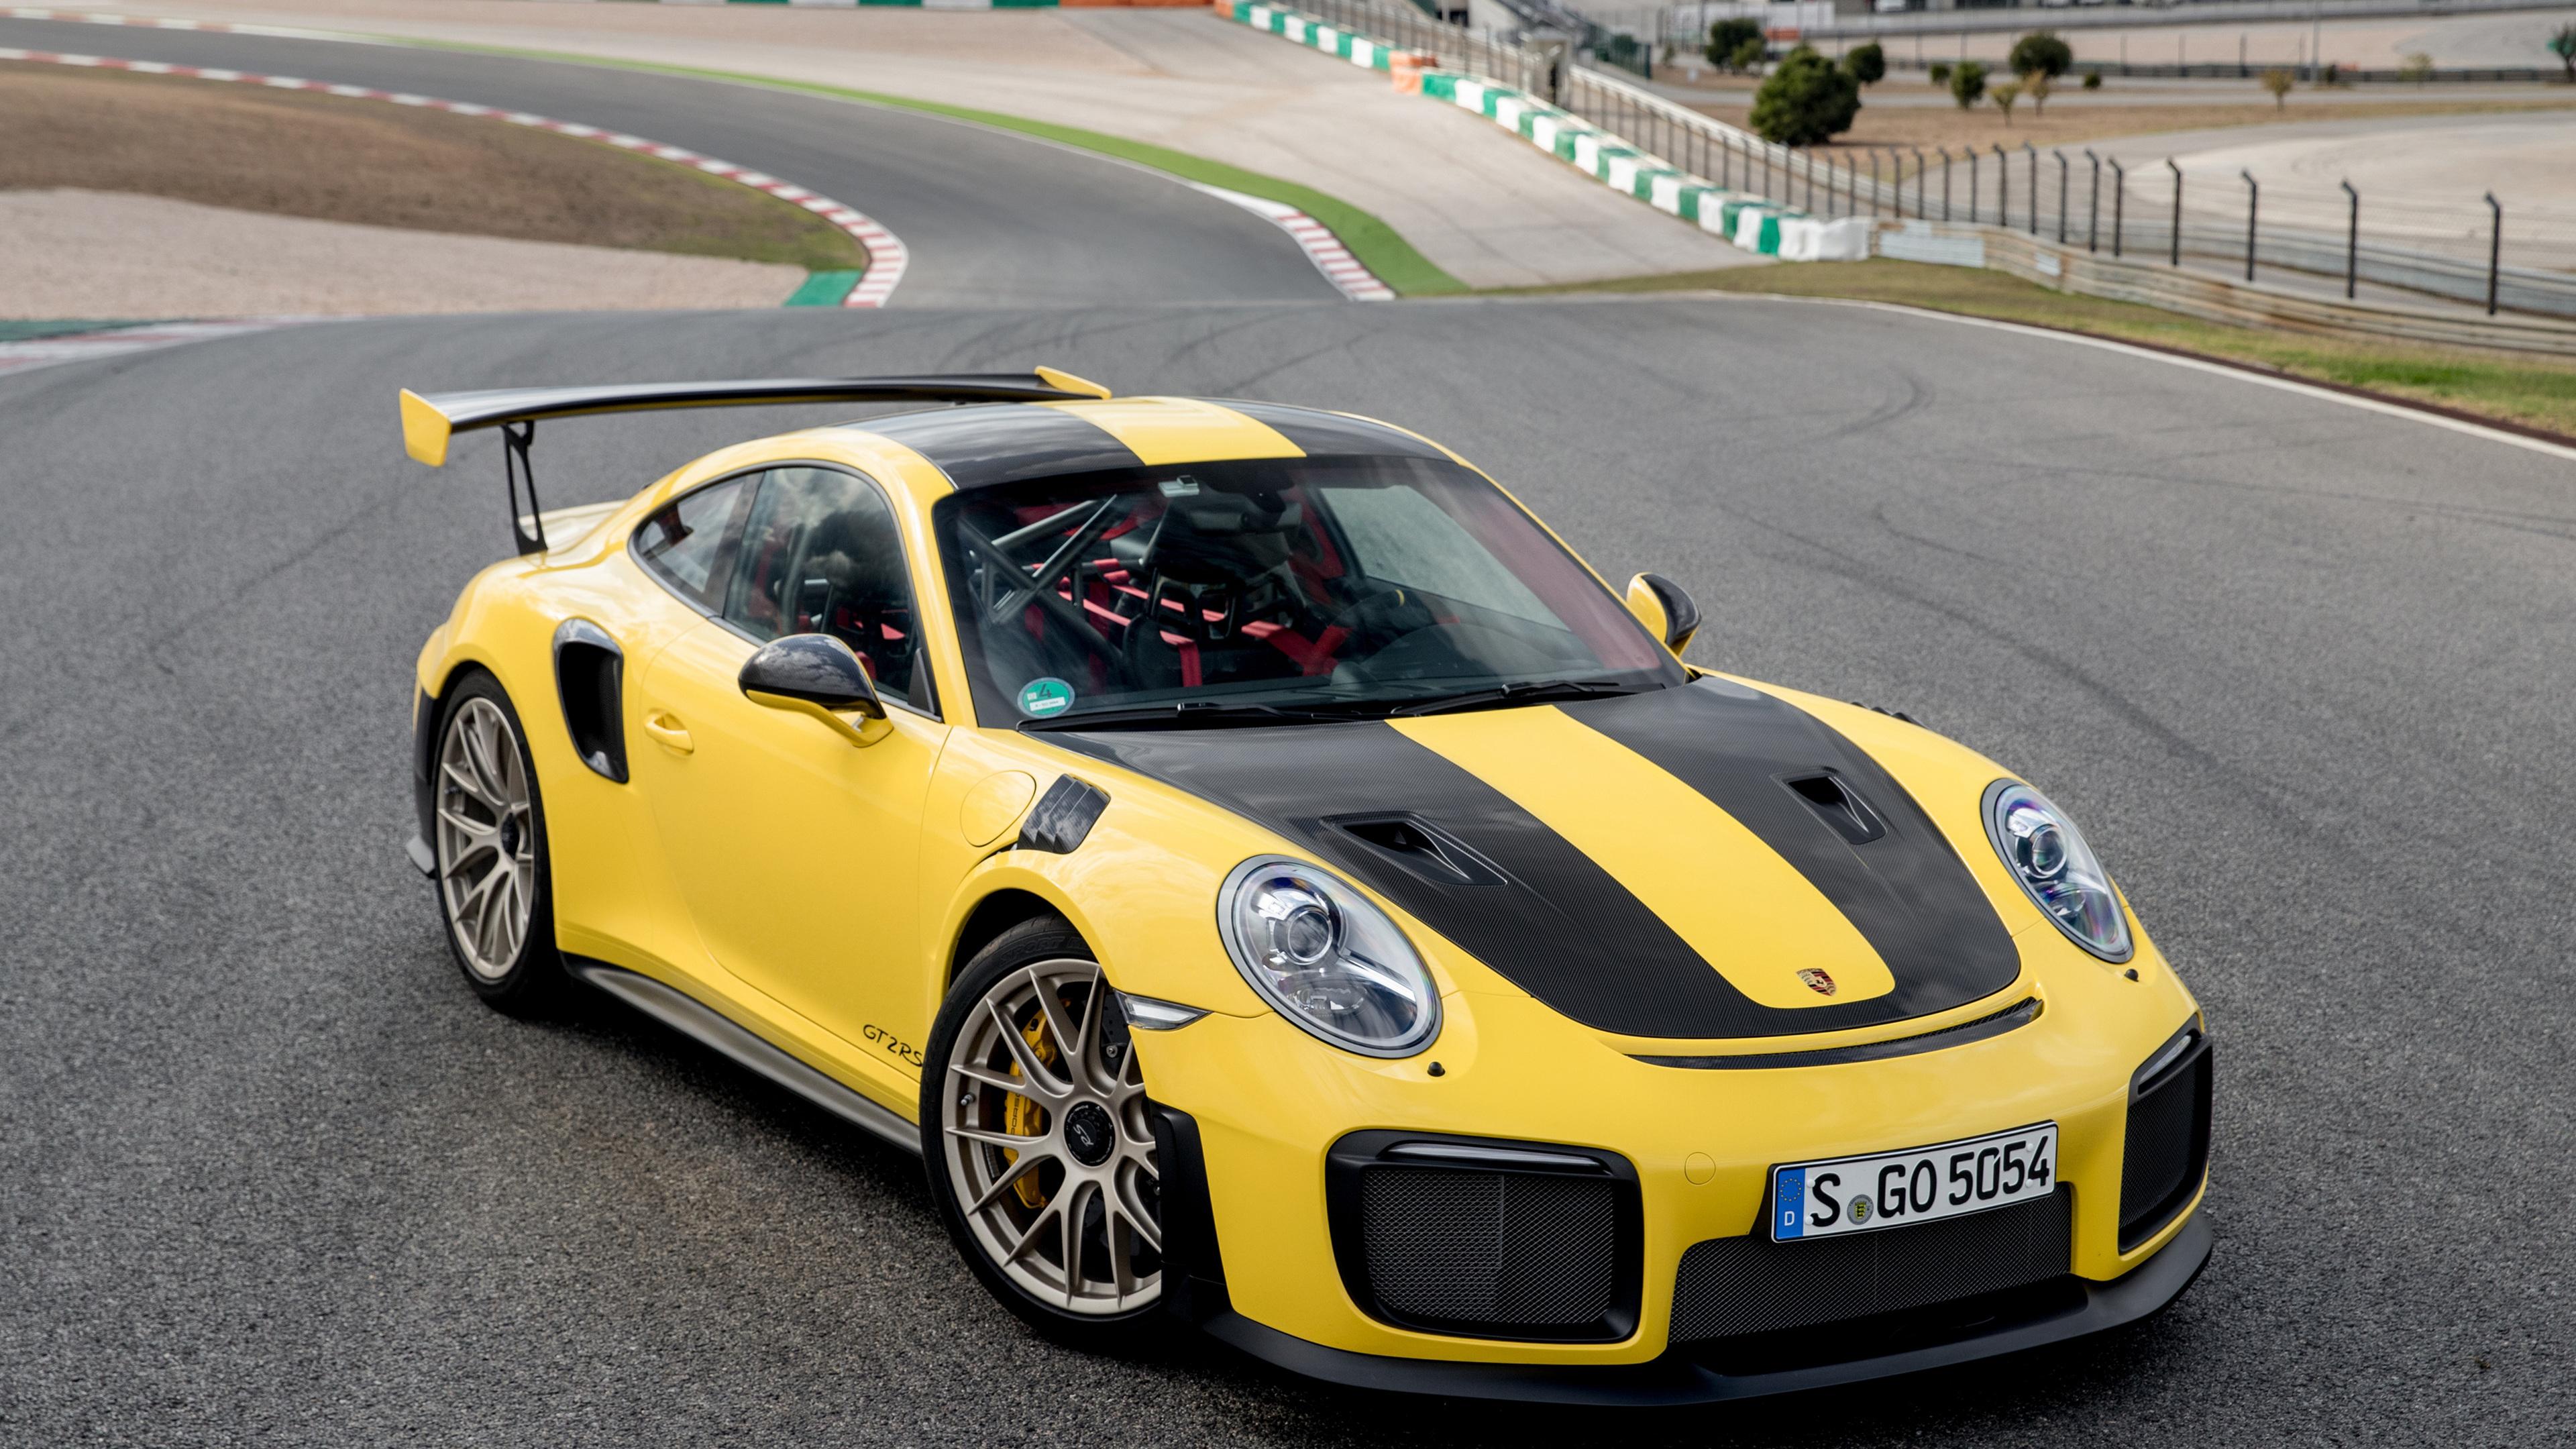 porsche 911 gt2 rs sports 1539107641 - Porsche 911 GT2 RS Sports - porsche wallpapers, porsche 911 wallpapers, hd-wallpapers, hd wallpapers2017 cars wallpapers, cars wallpapers, 4k-wallpapers